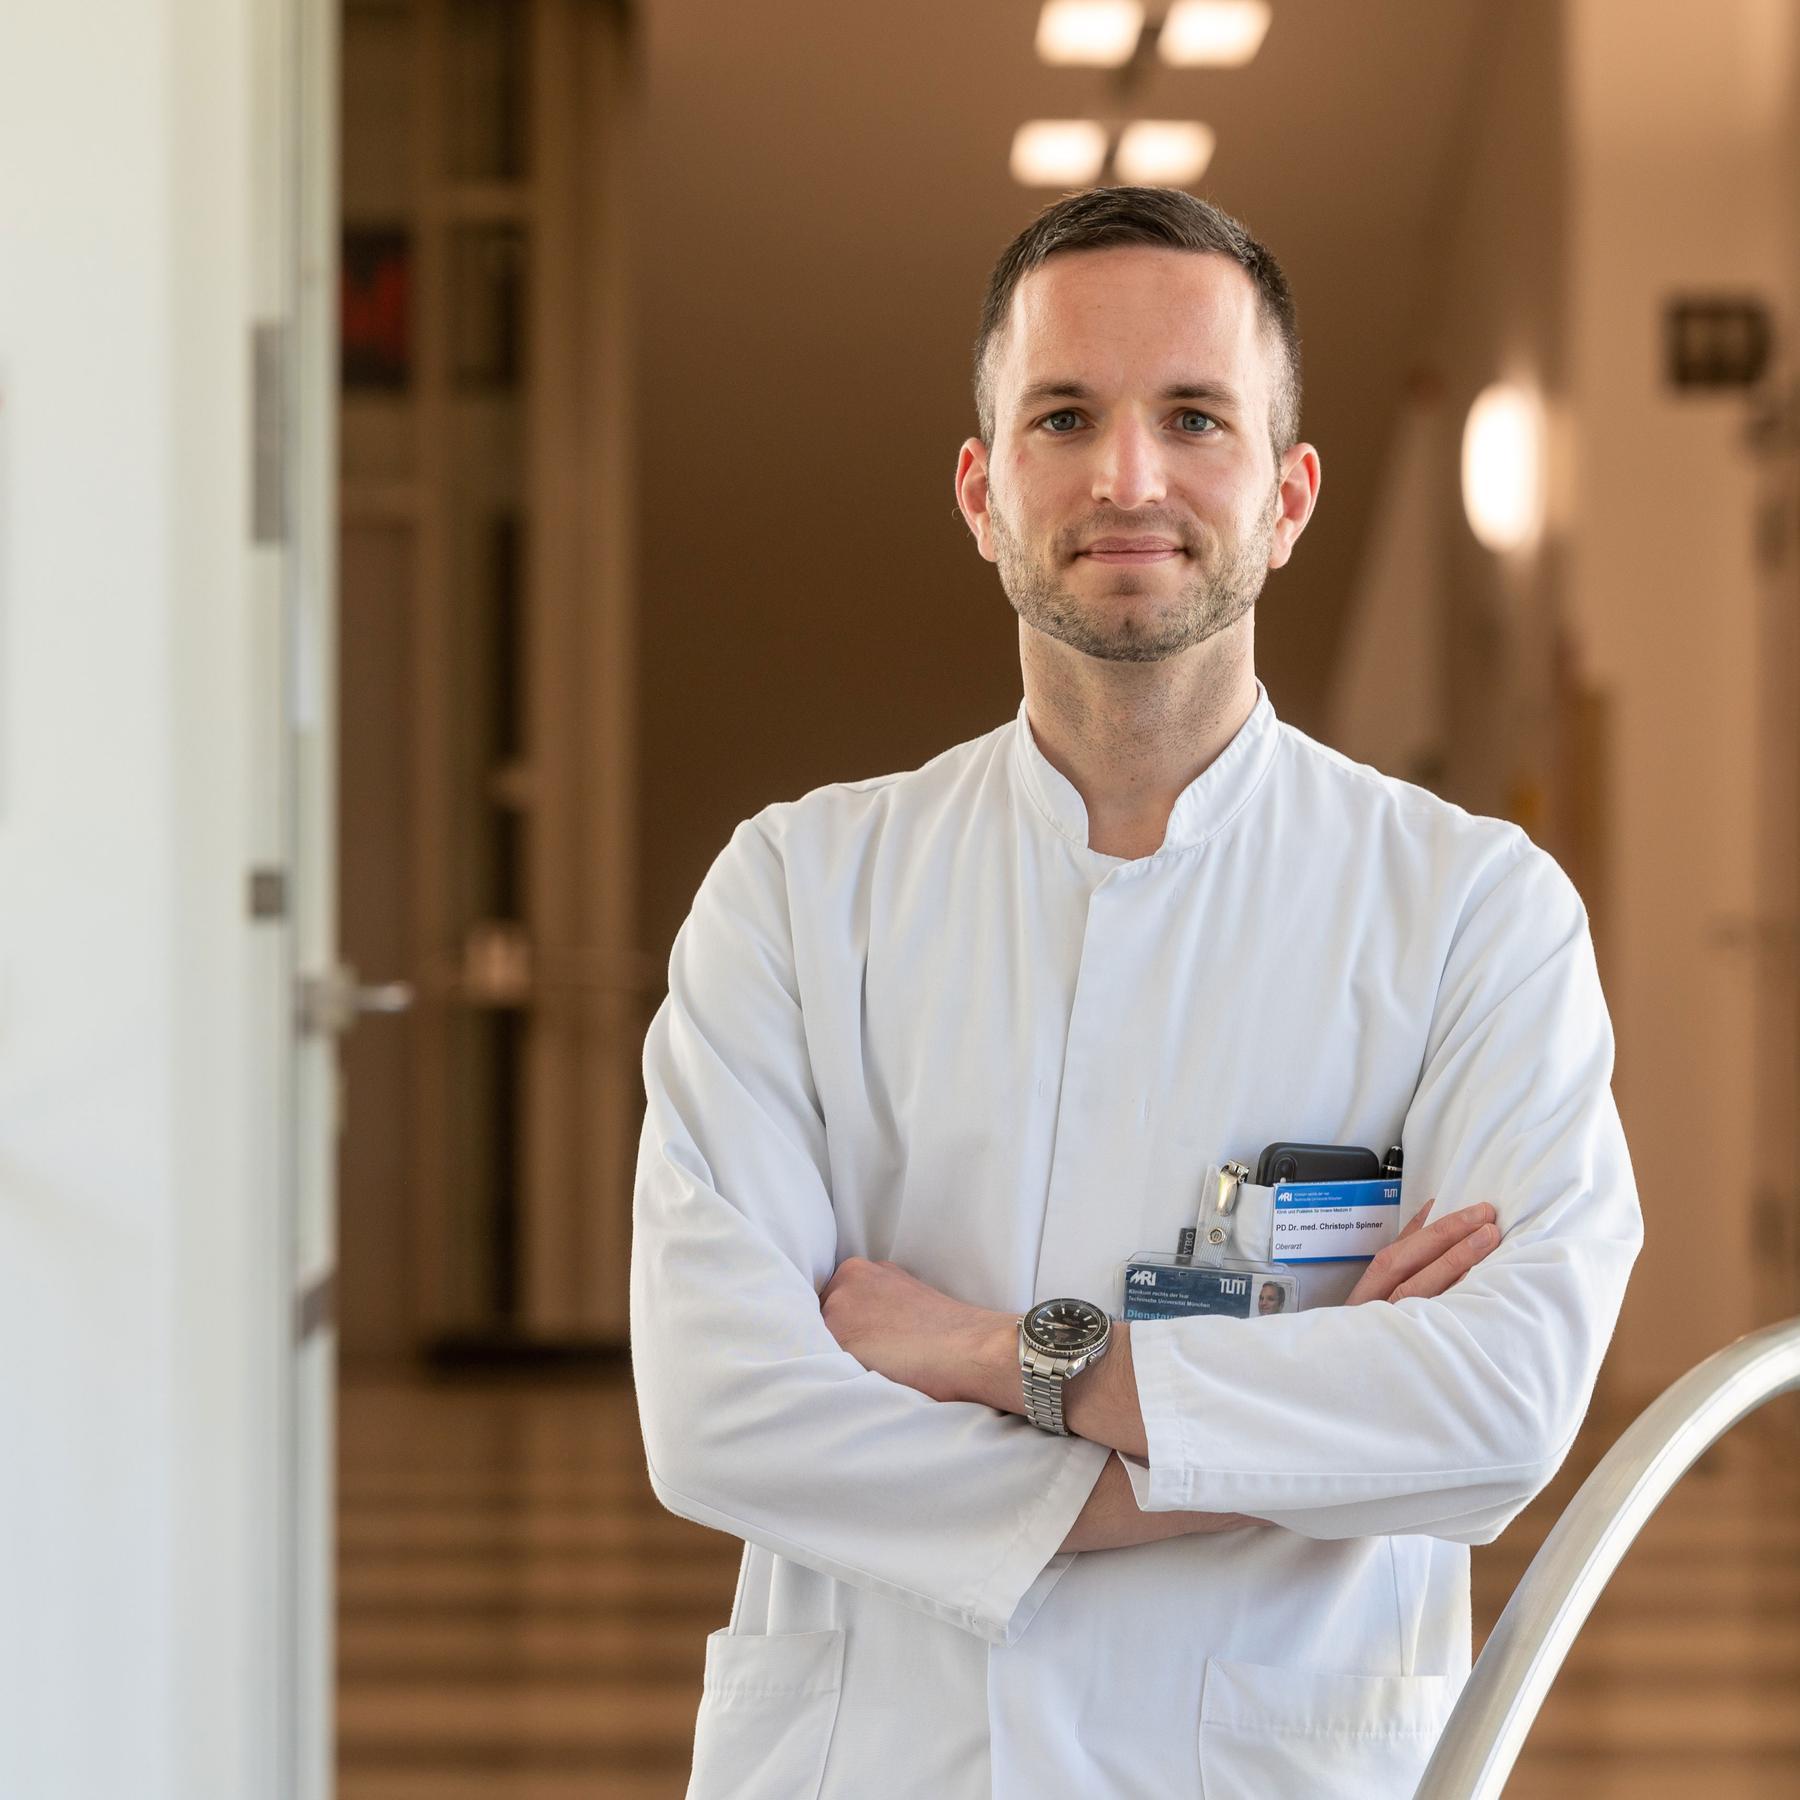 Corona-News mit Dr. Christoph Spinner (04.08.2021)